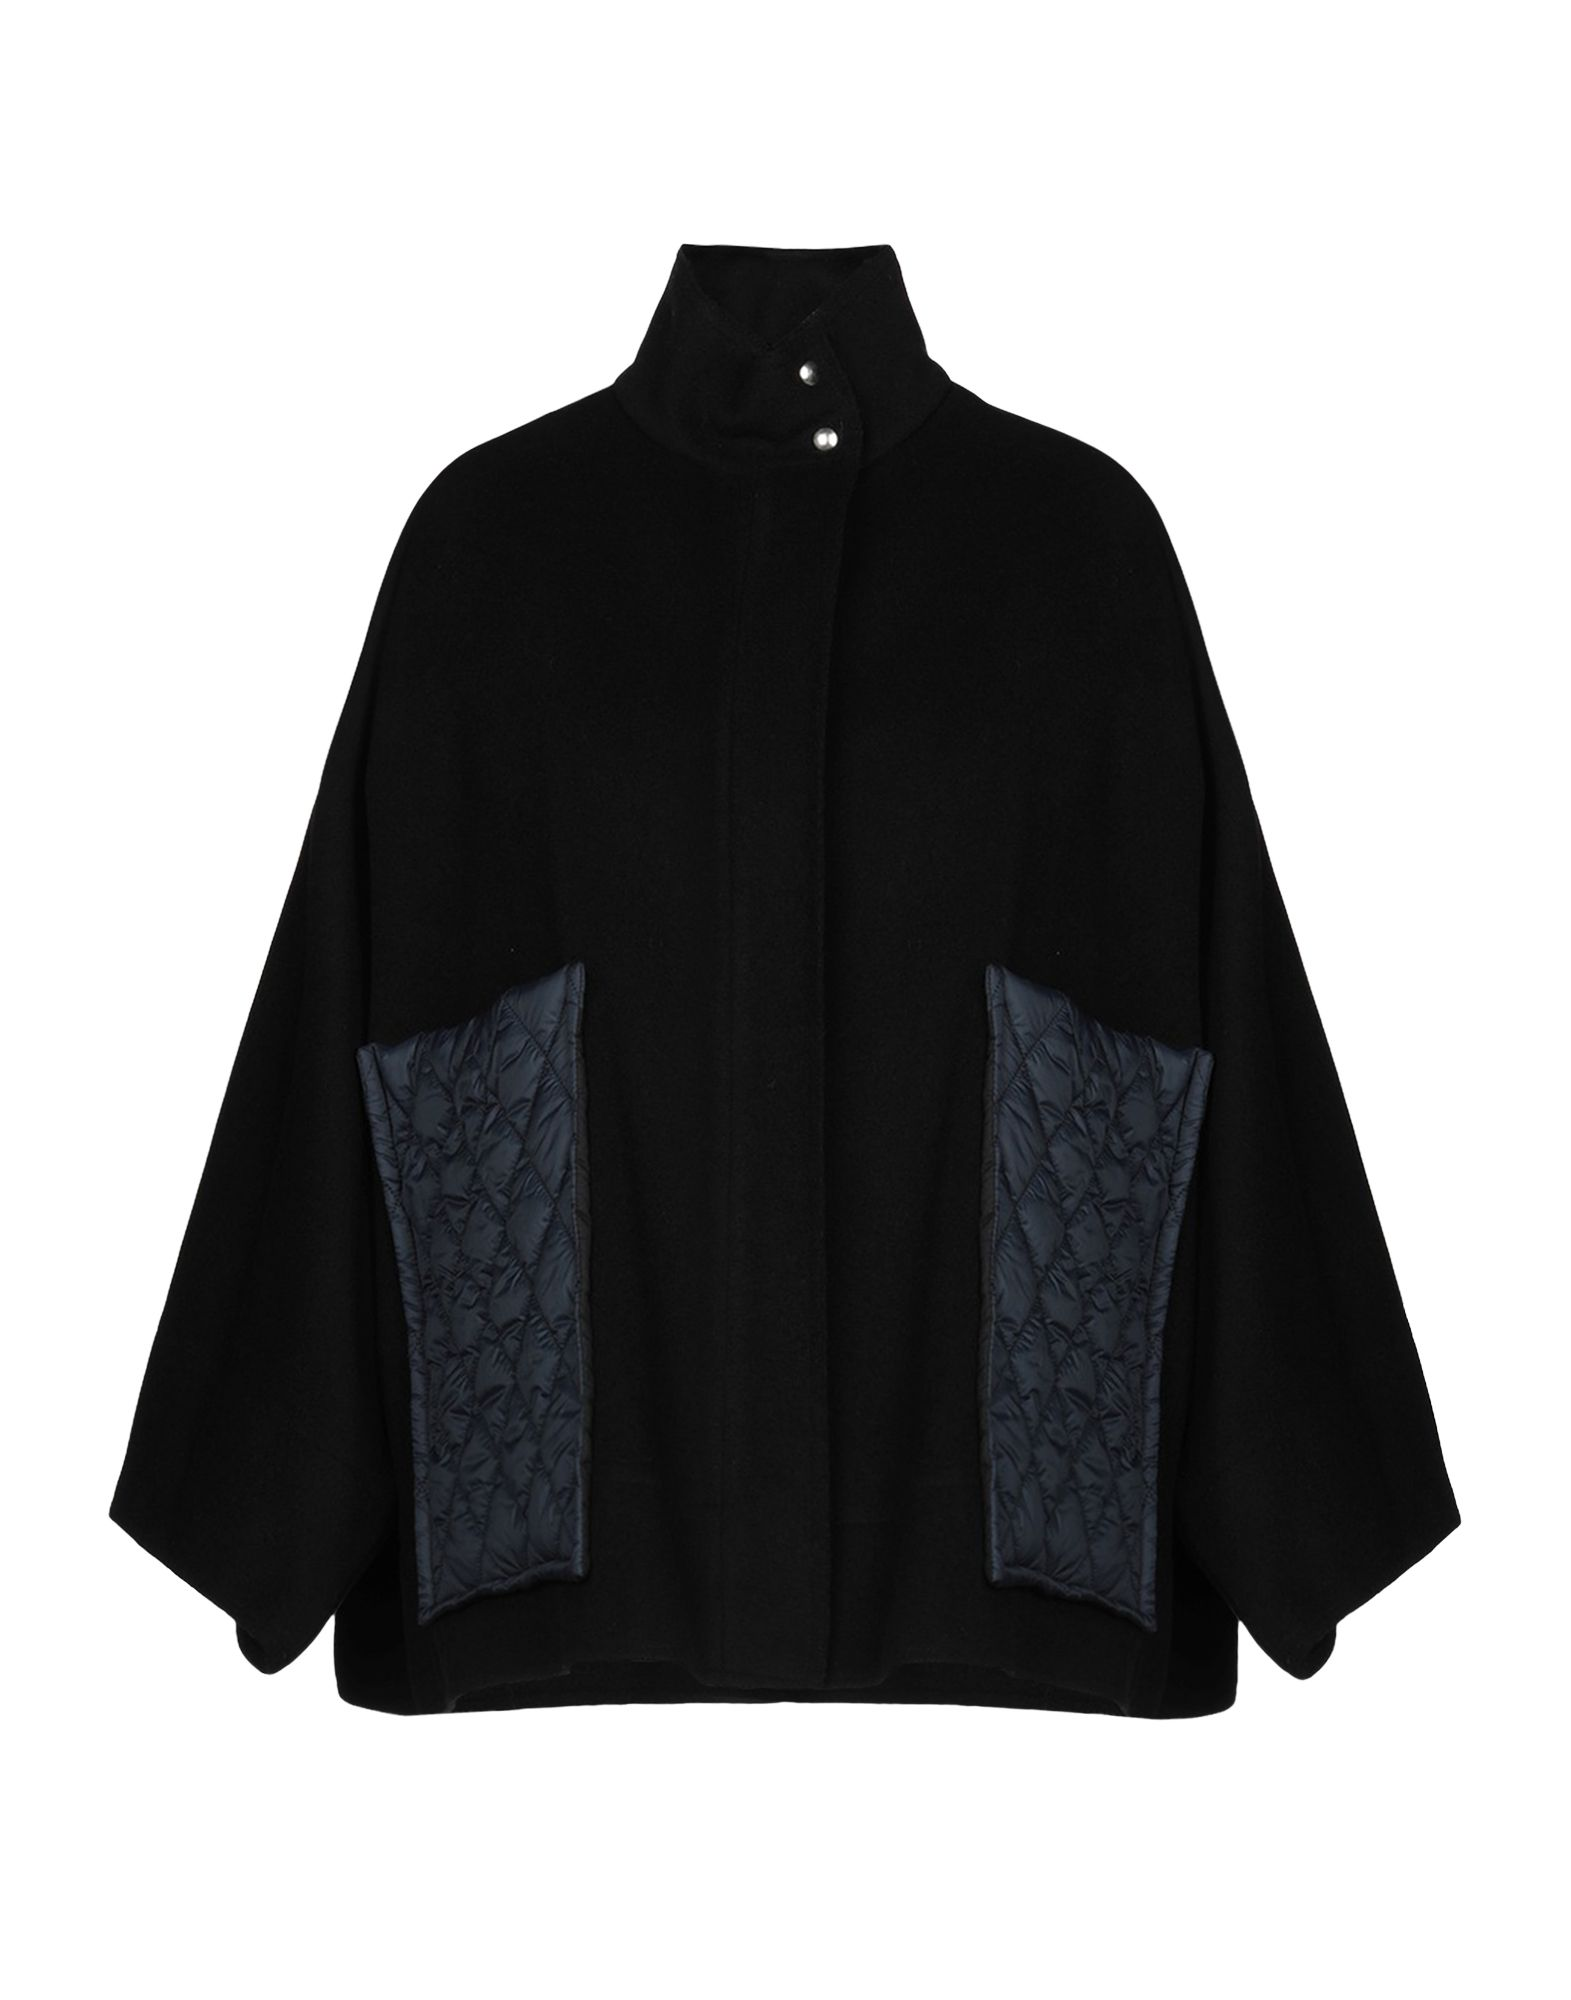 COLLECTION PRIVĒE? Пальто collection privēe легкое пальто